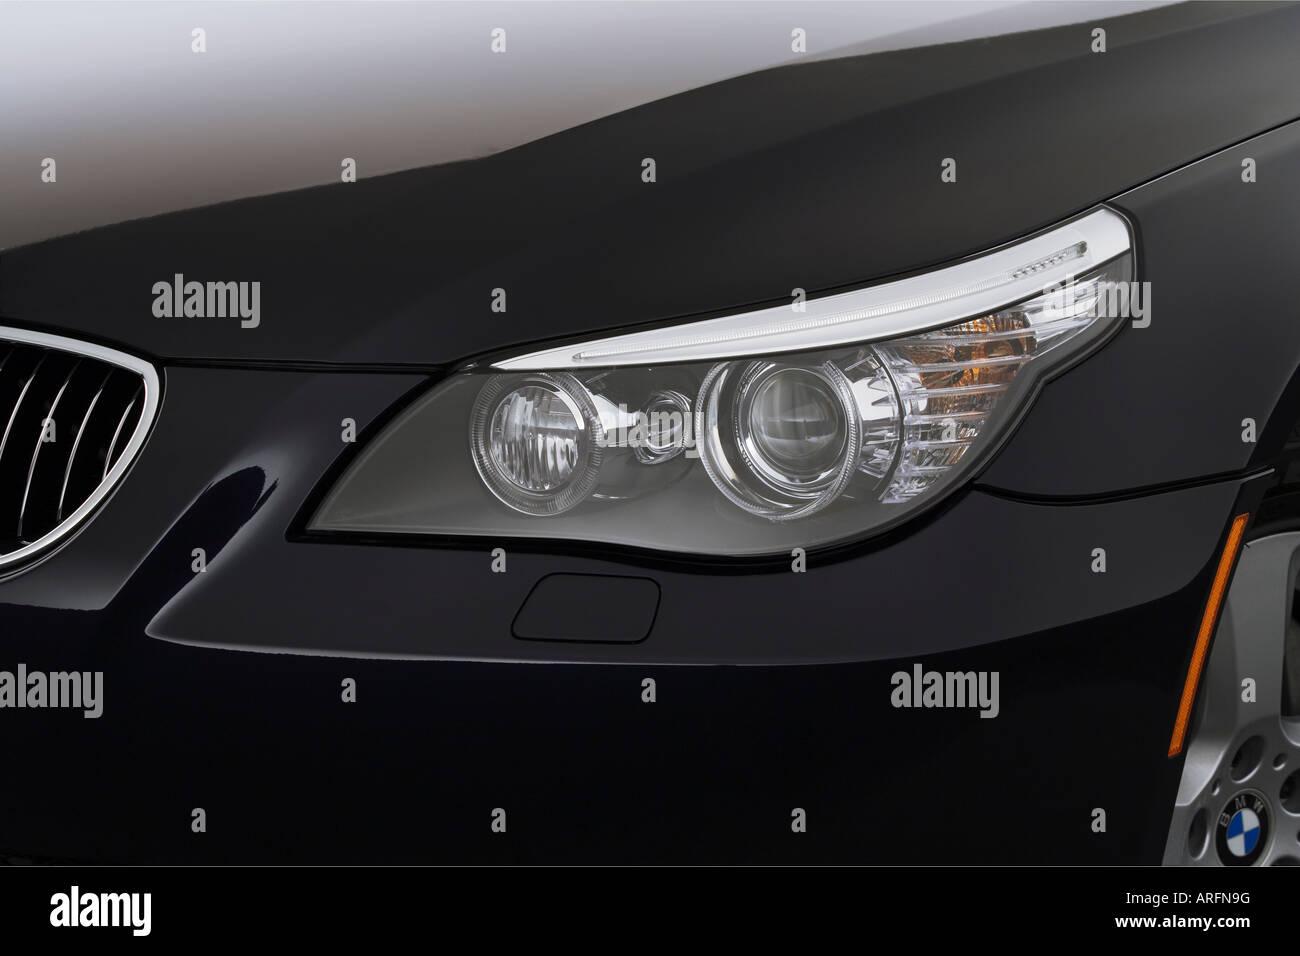 2008 BMW 5-series 535xi in Blue - Headlight Stock Photo: 16041531